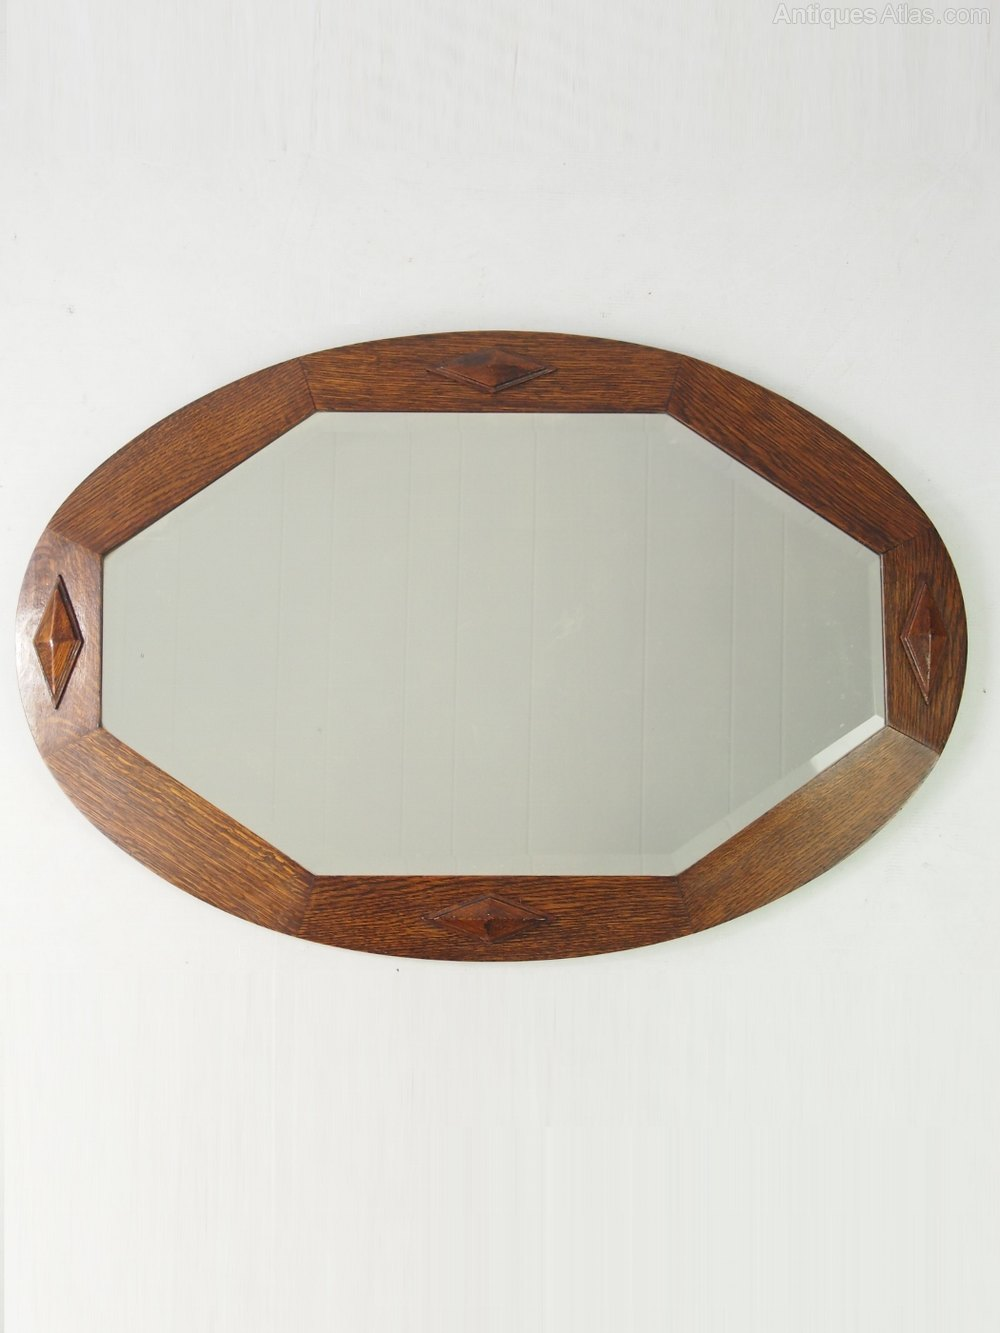 Antiques atlas vintage oval oak framed mirror for Mirror 40cm wide